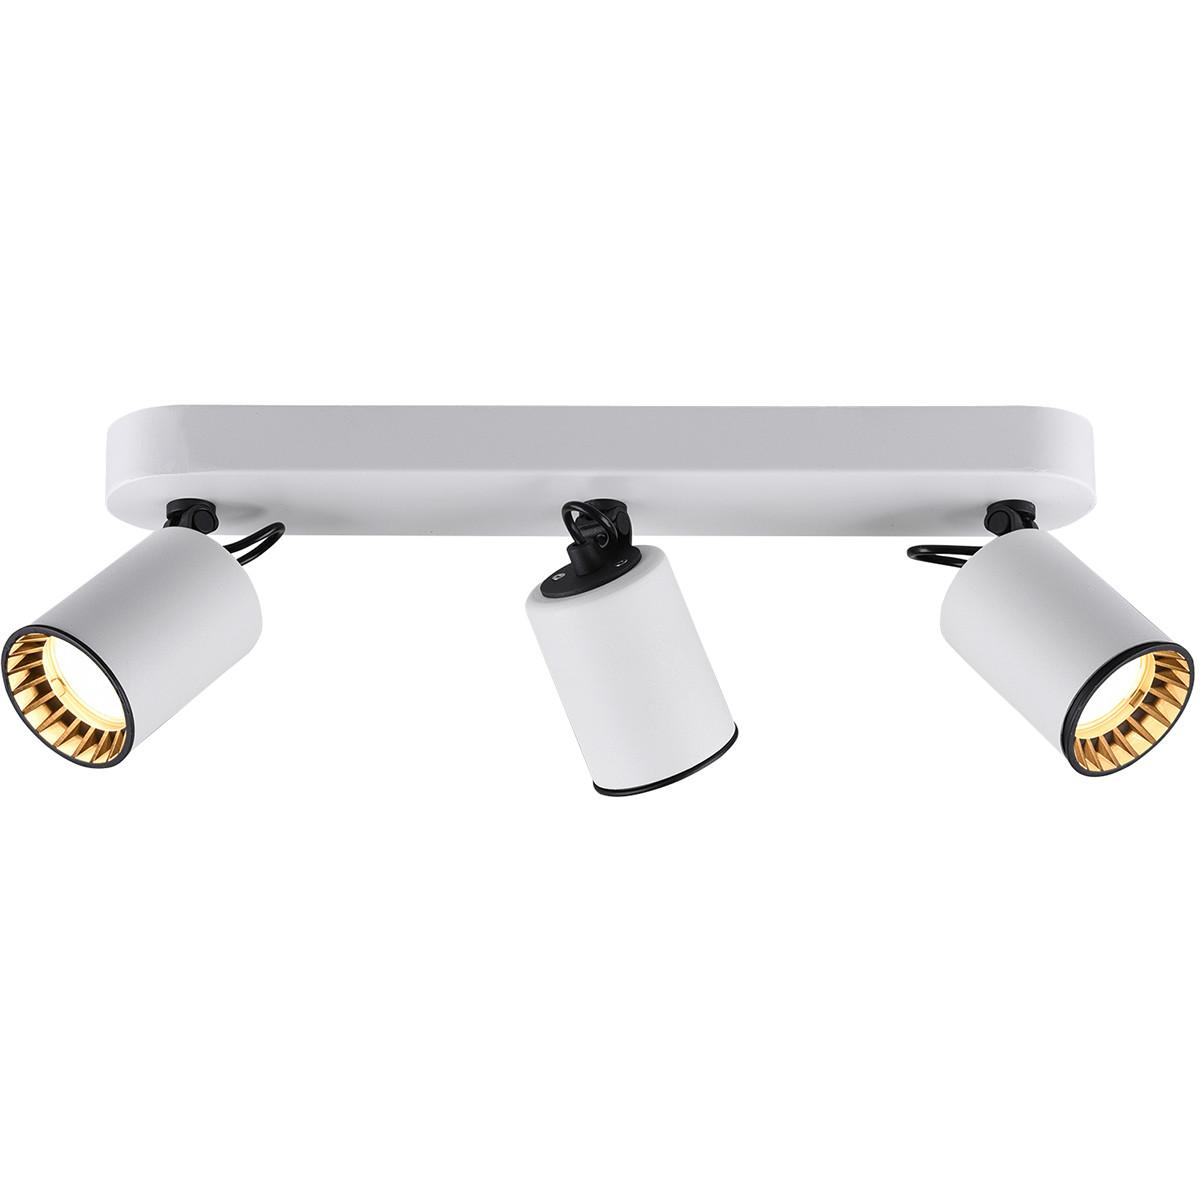 LED Plafondspot - Trion Pirlo - GU10 Fitting - 3-lichts - Rechthoek - Mat Wit - Aluminium